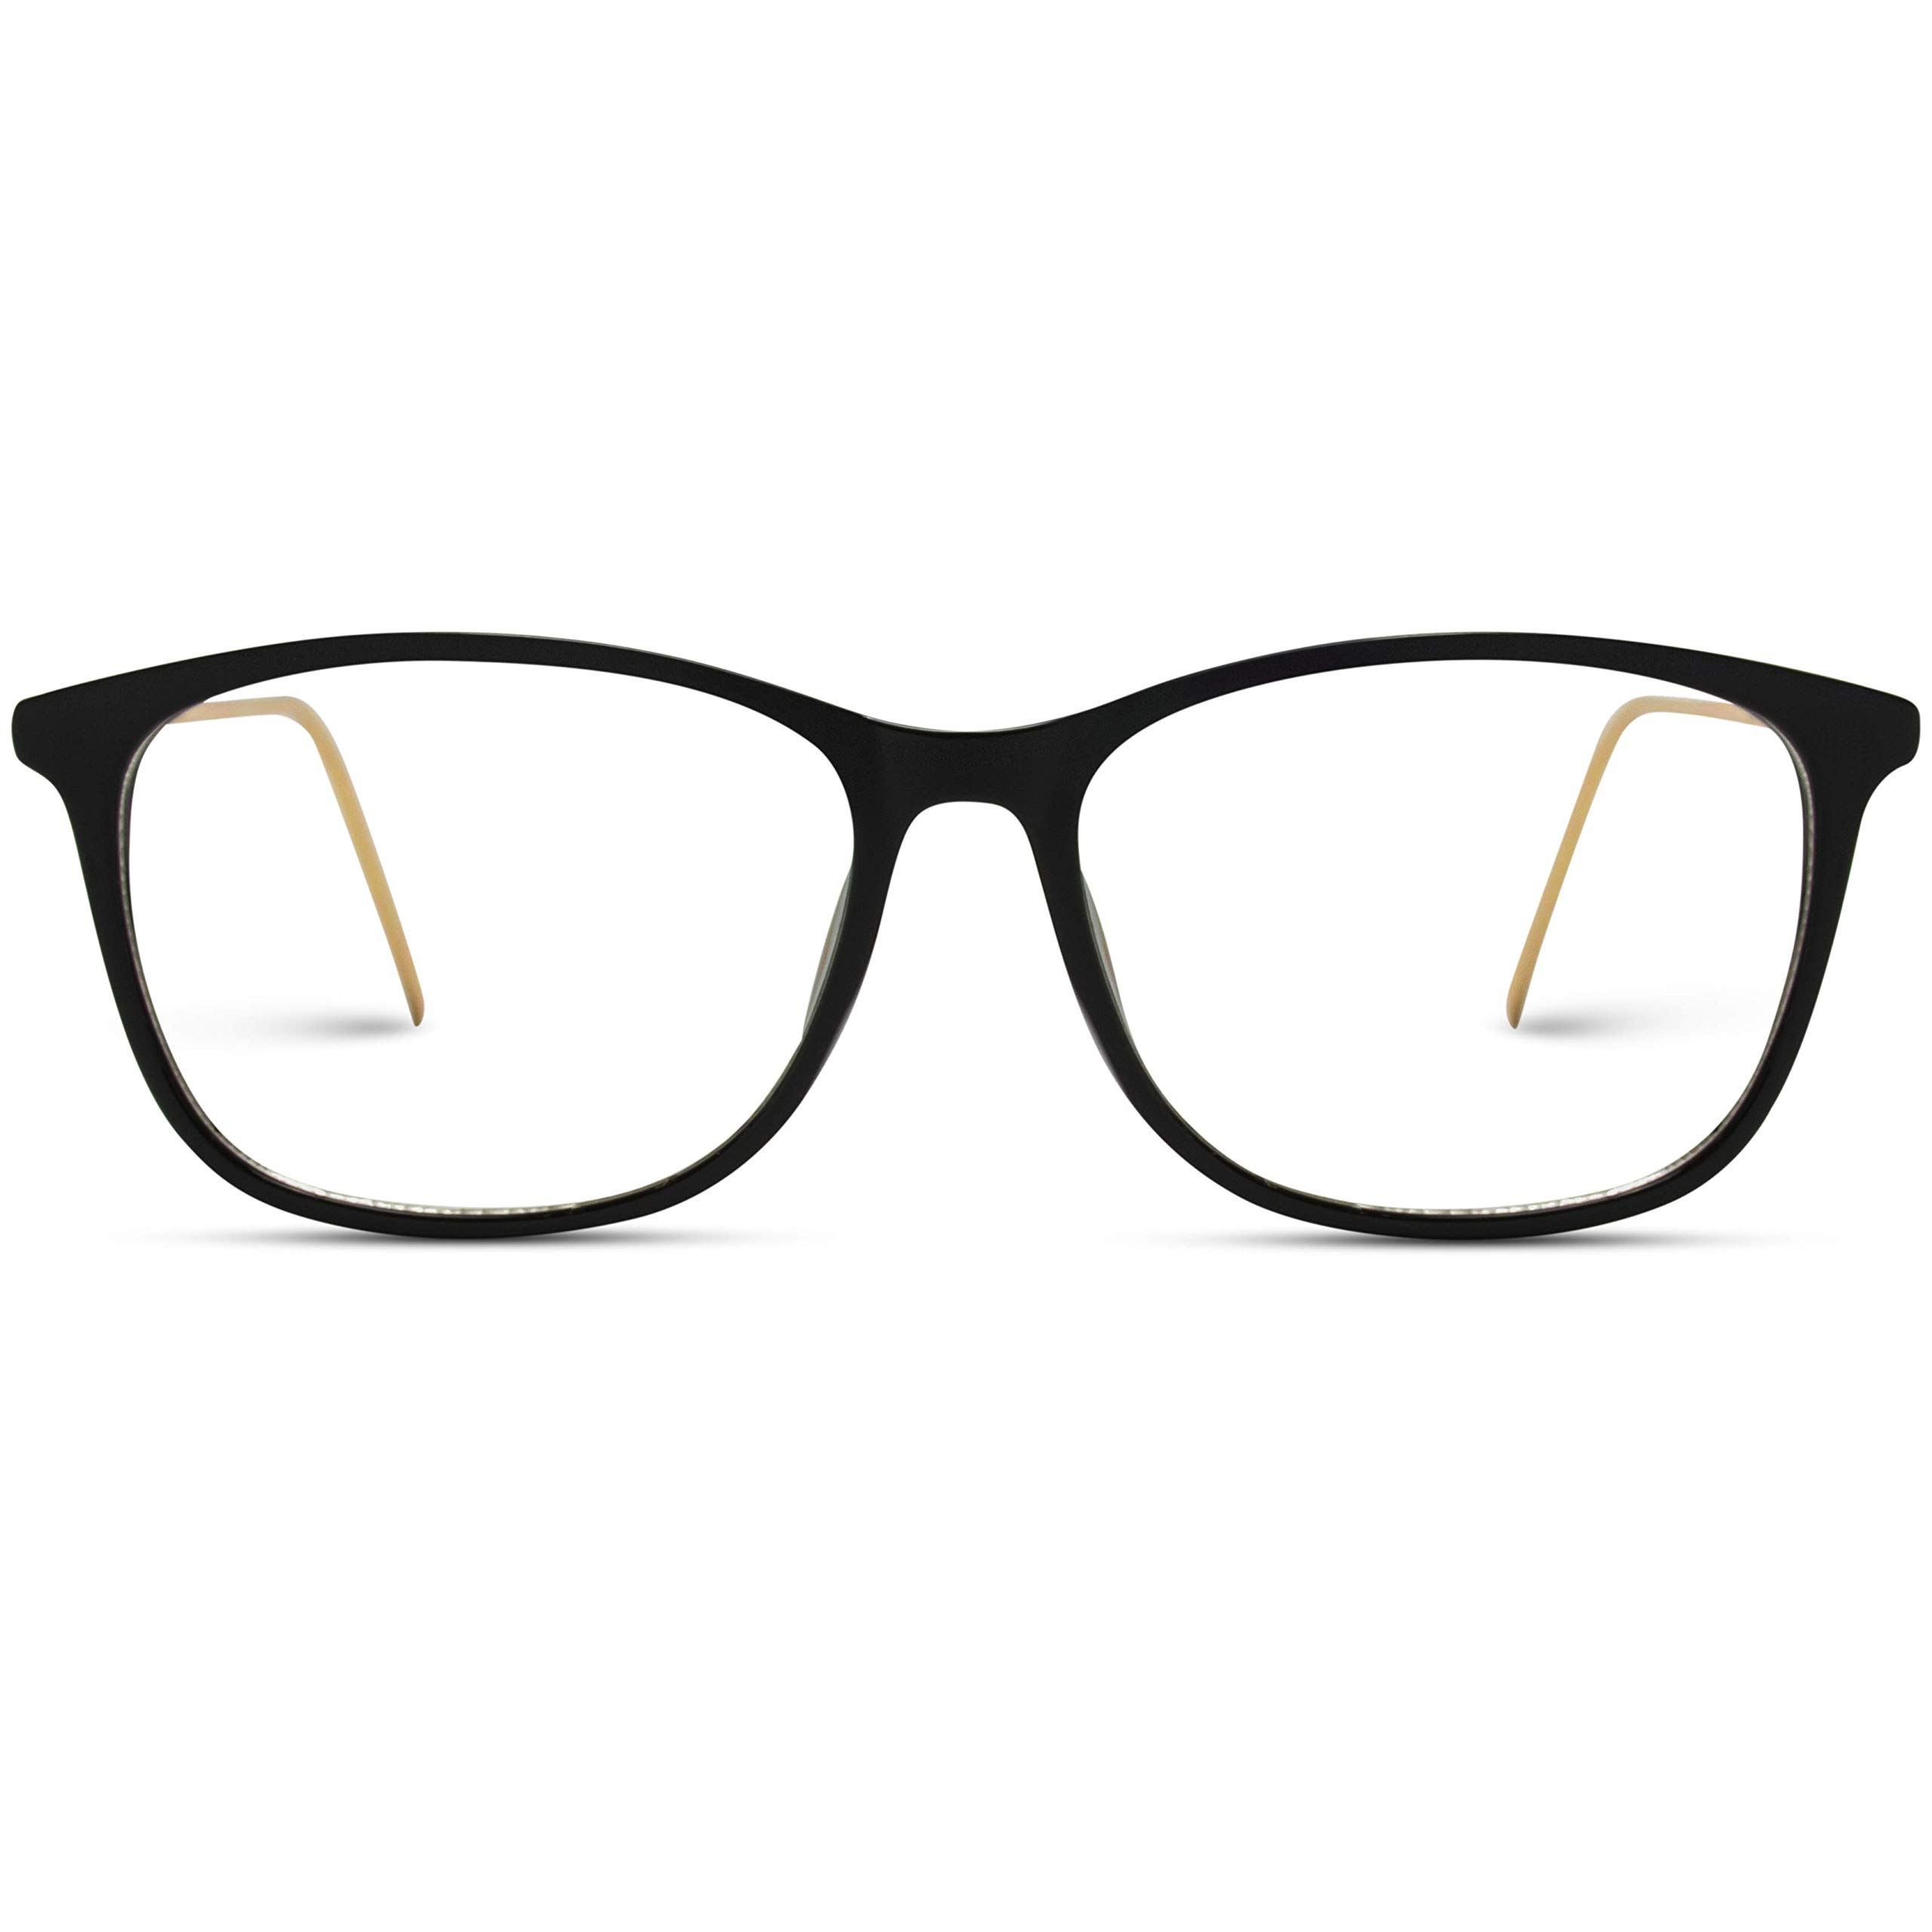 WearMe Pro - Rectangular Slim Elegant Fashion Clear Glasses by WearMe Pro